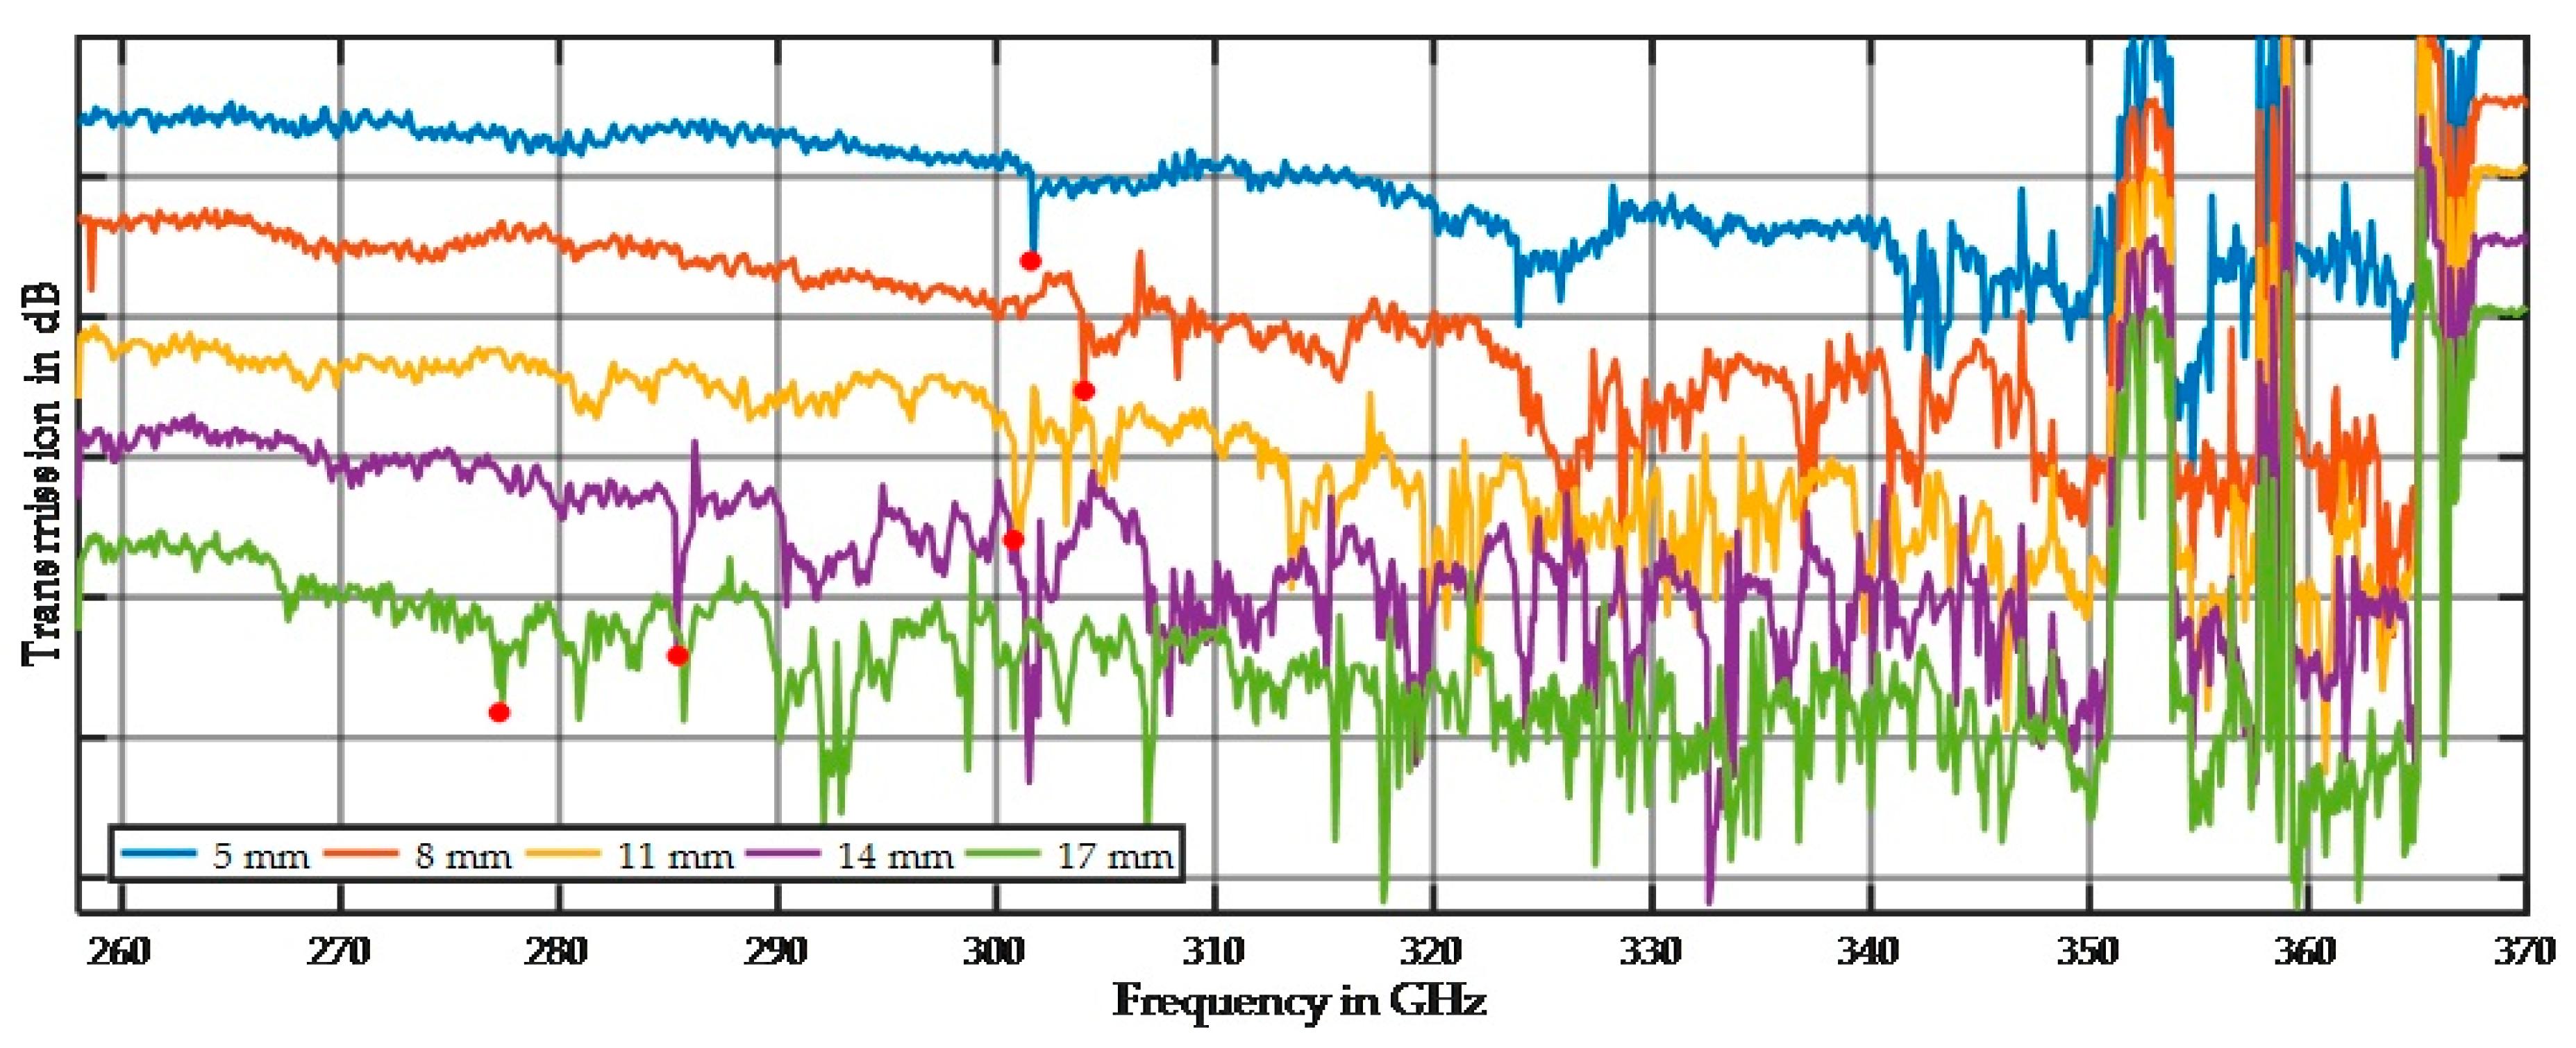 terahertz spectroscopy approach Protein dynamics has been studied using terahertz spectroscopy  the terahertz spectroscopic analysis of peptides  approach thz spectroscopy of.